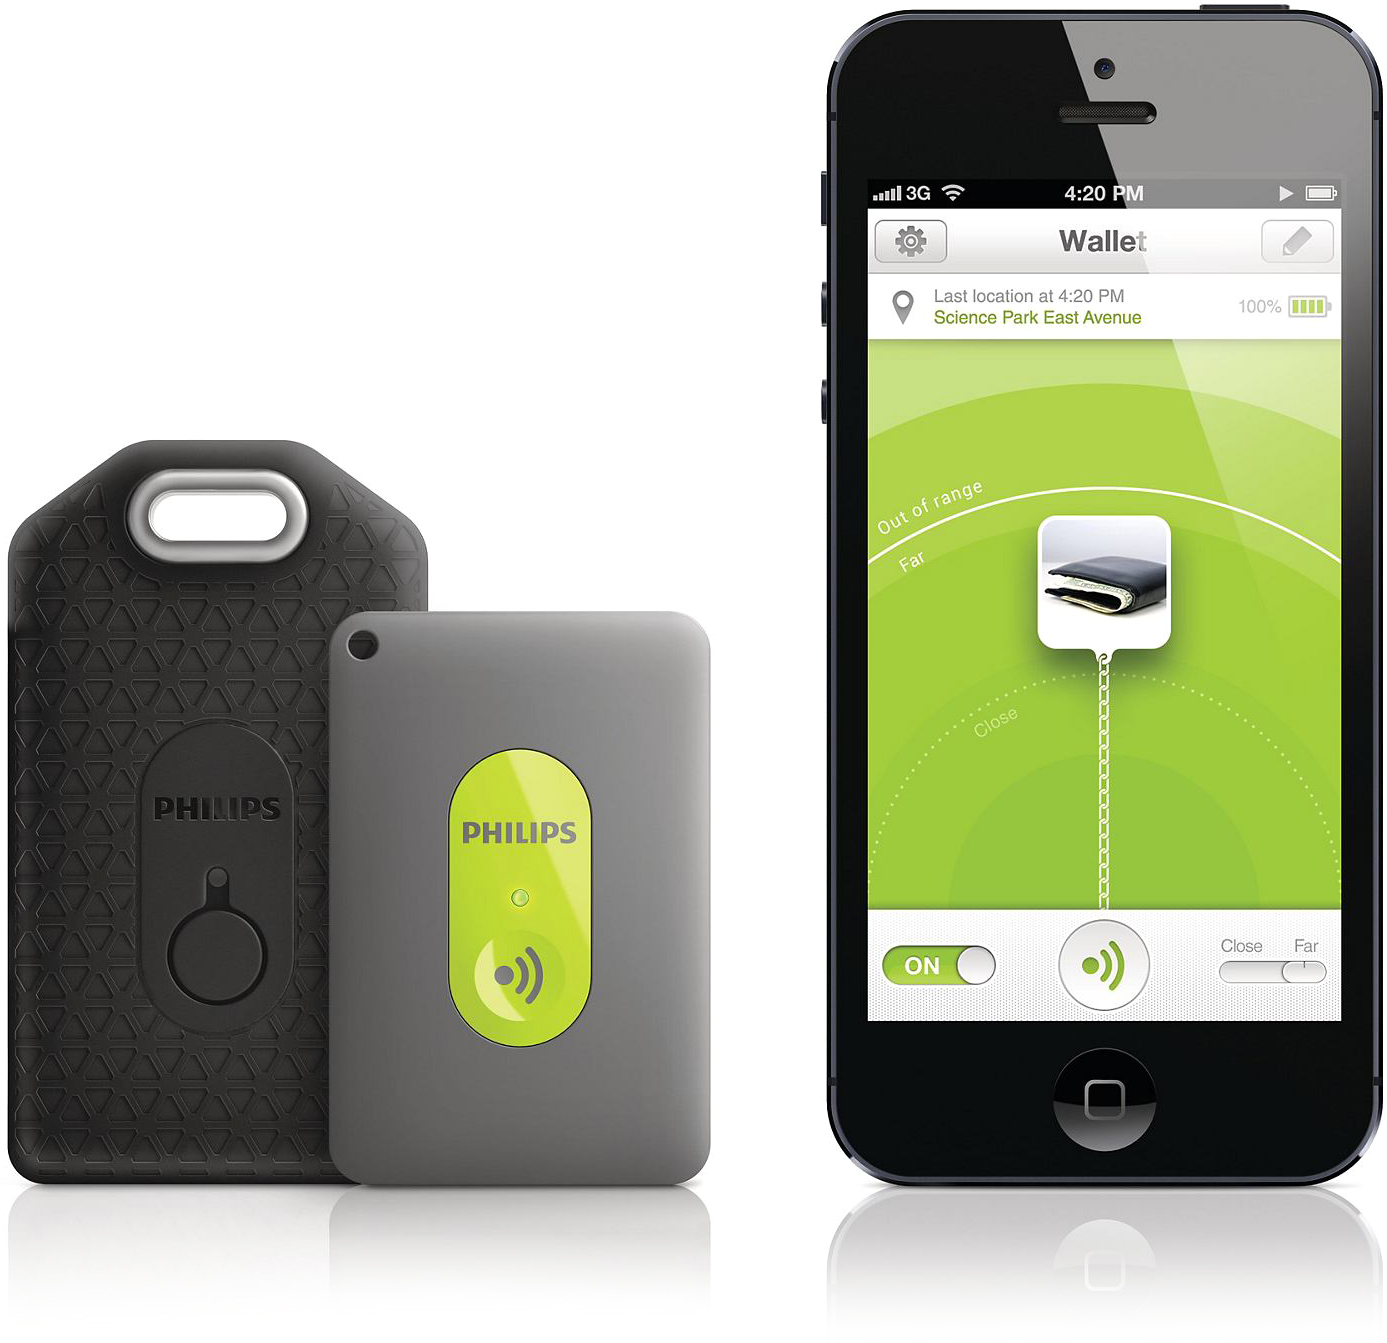 Philips InRange com iPhone